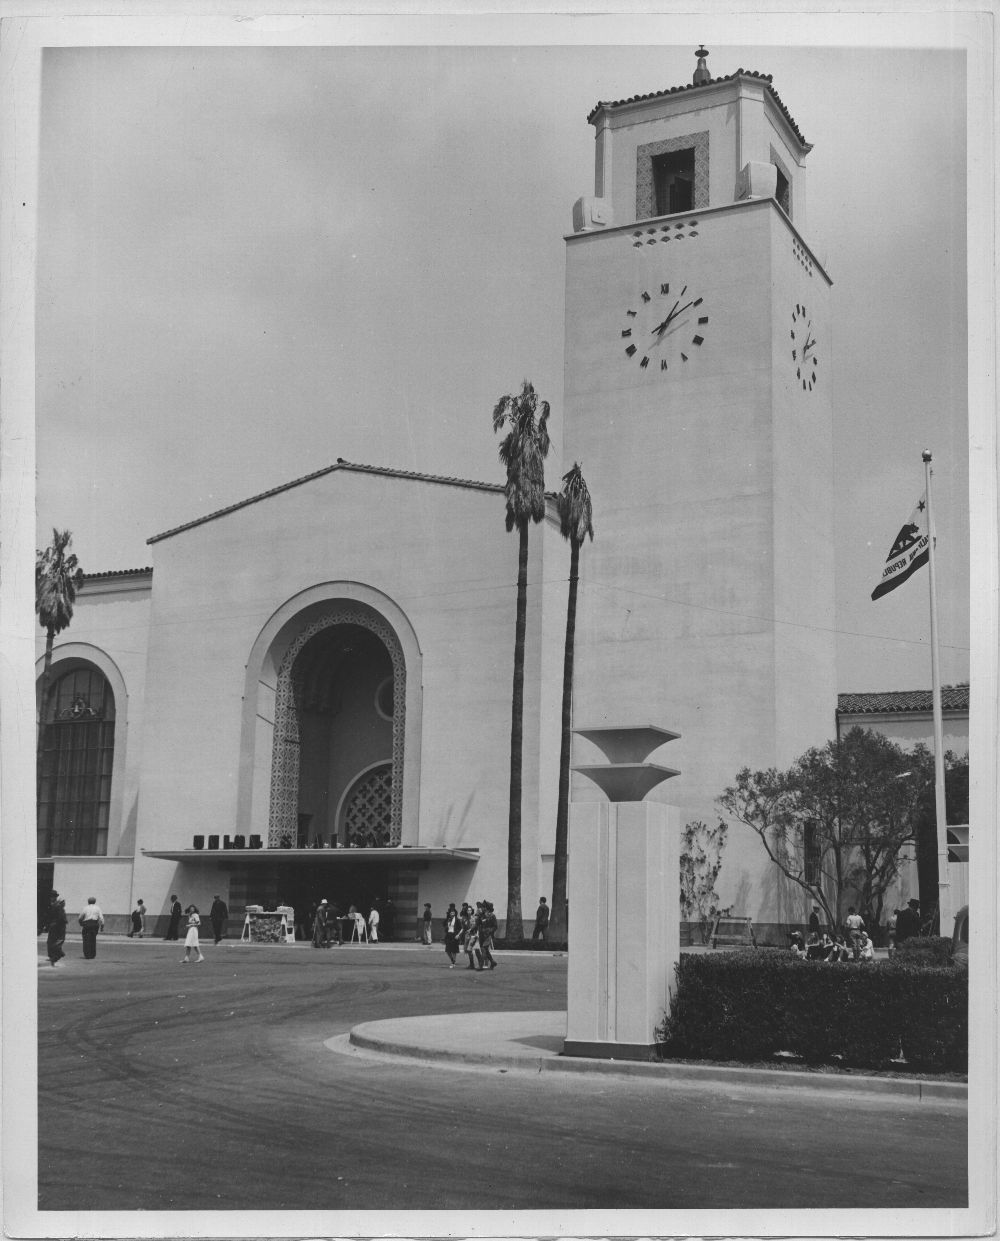 Los Angeles Union Passenger Terminal, Los Angeles, California